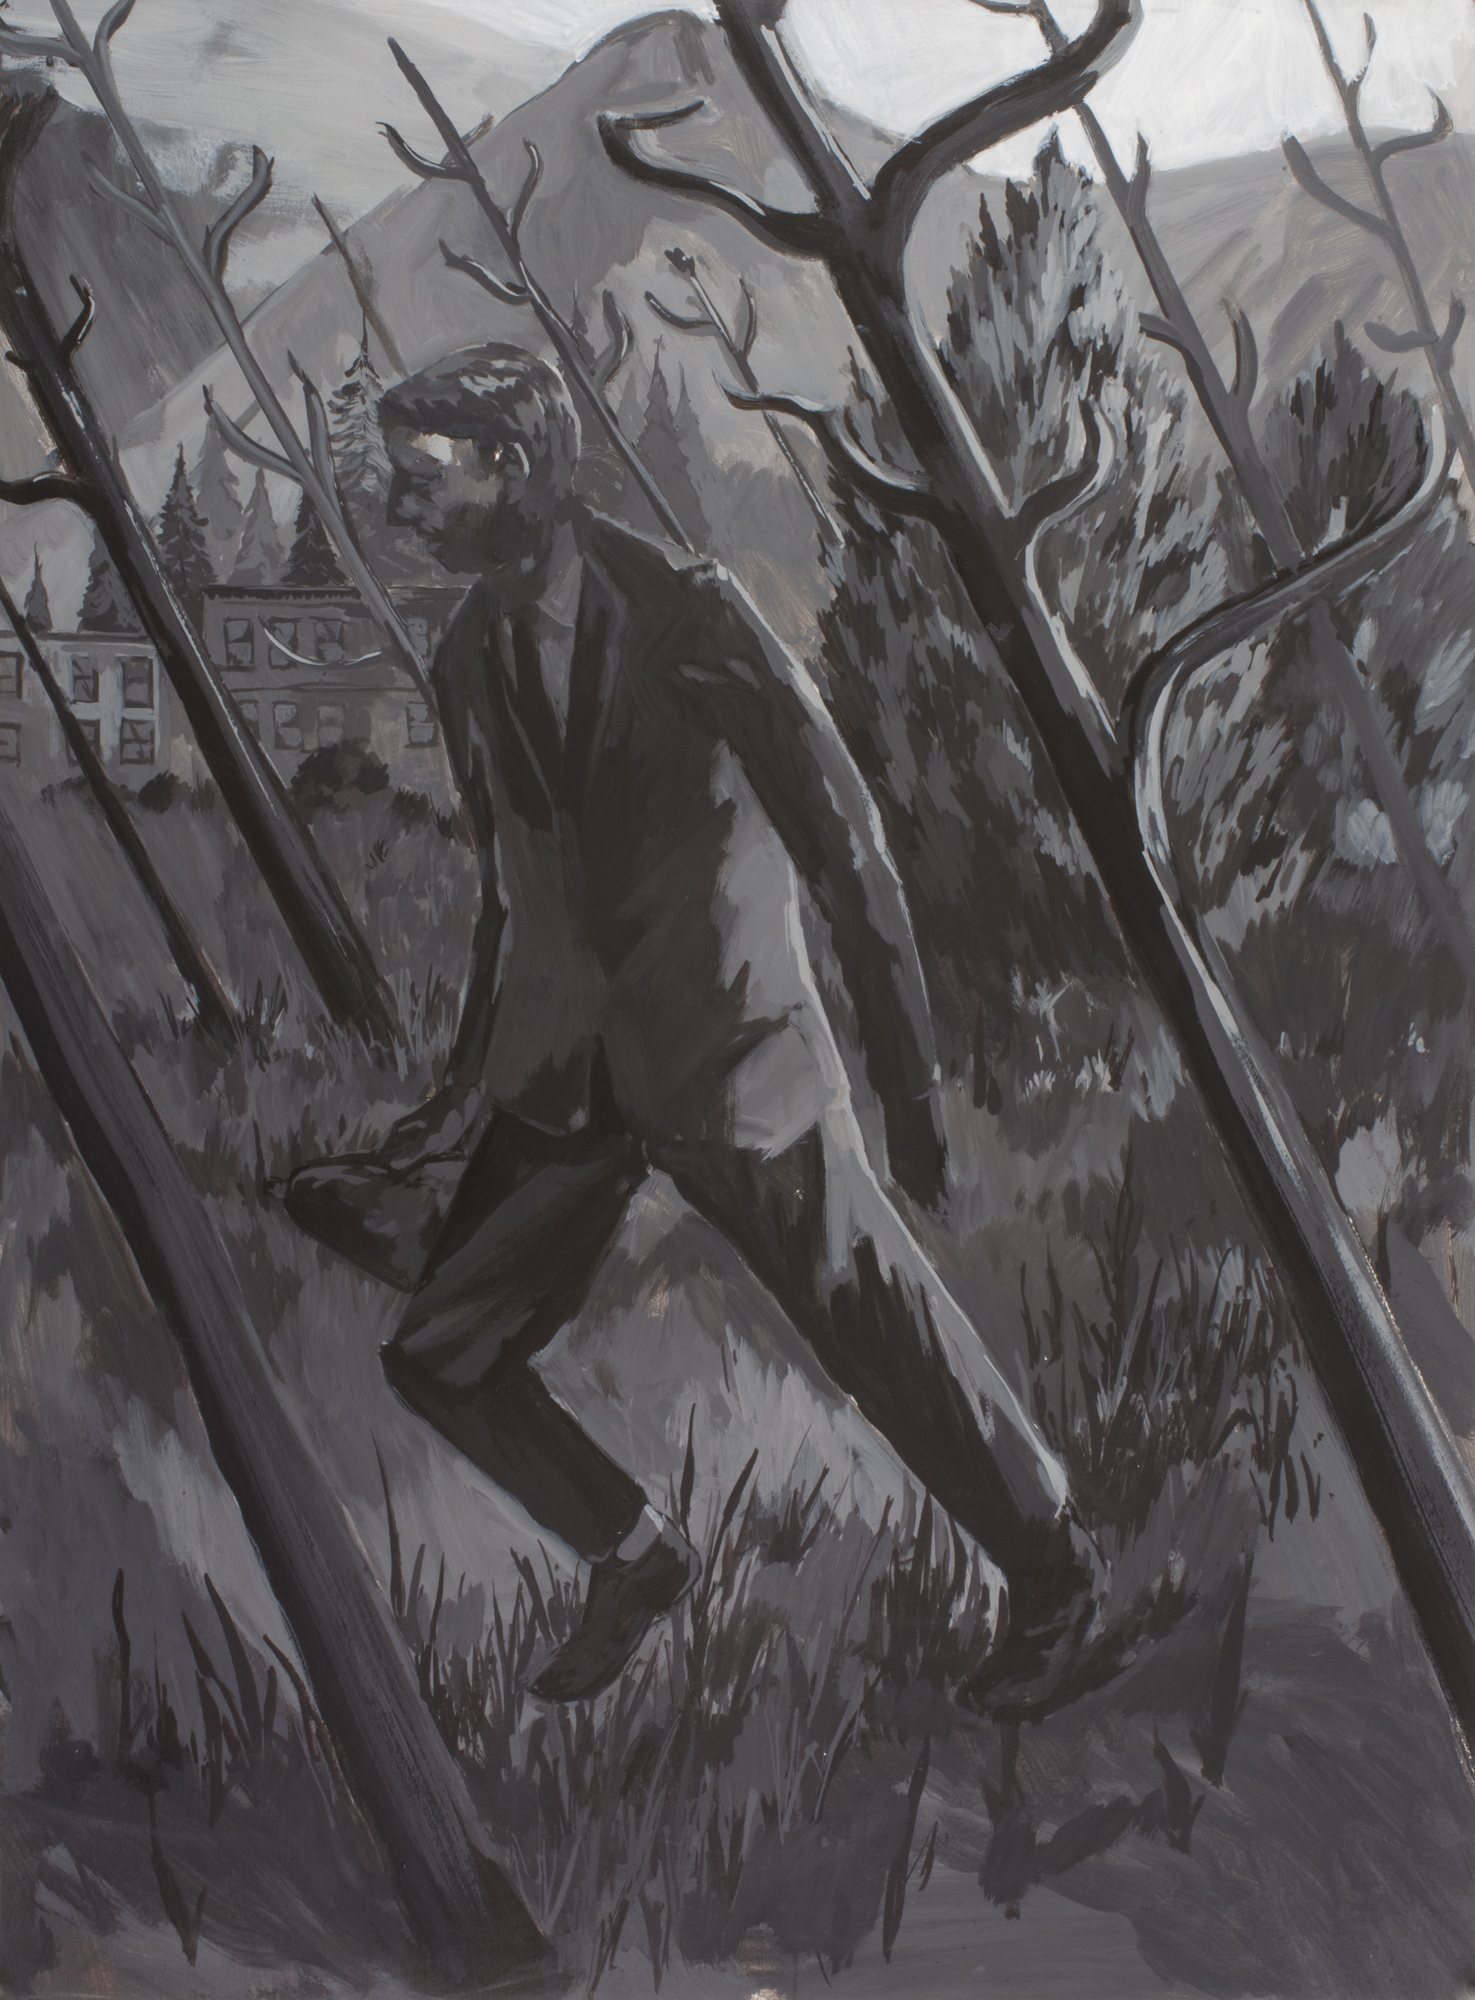 Untitled (Man in Landscape)